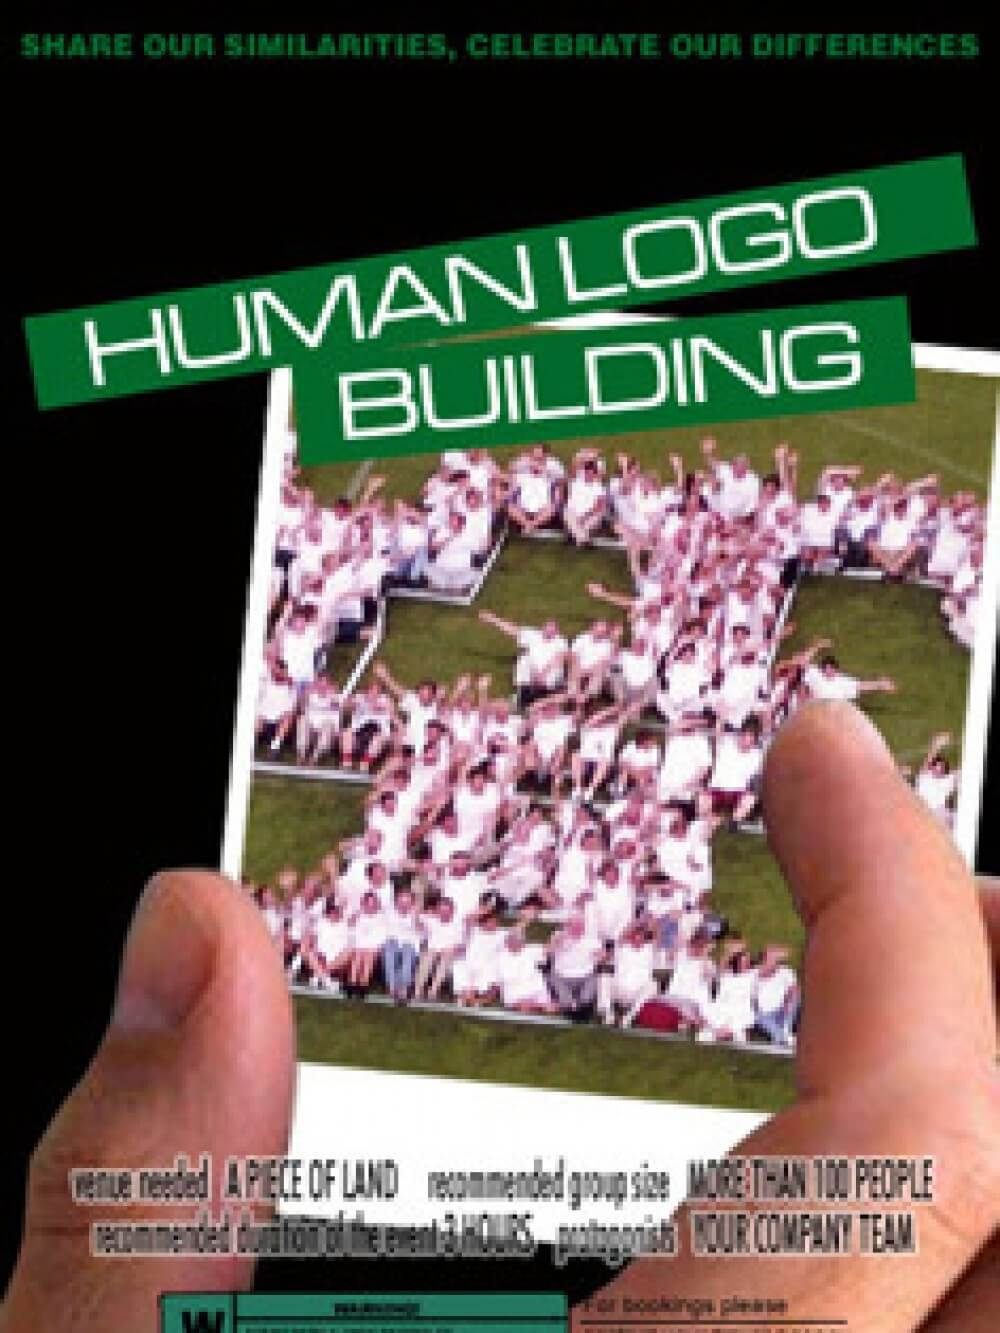 human_logo_building_vertical_web